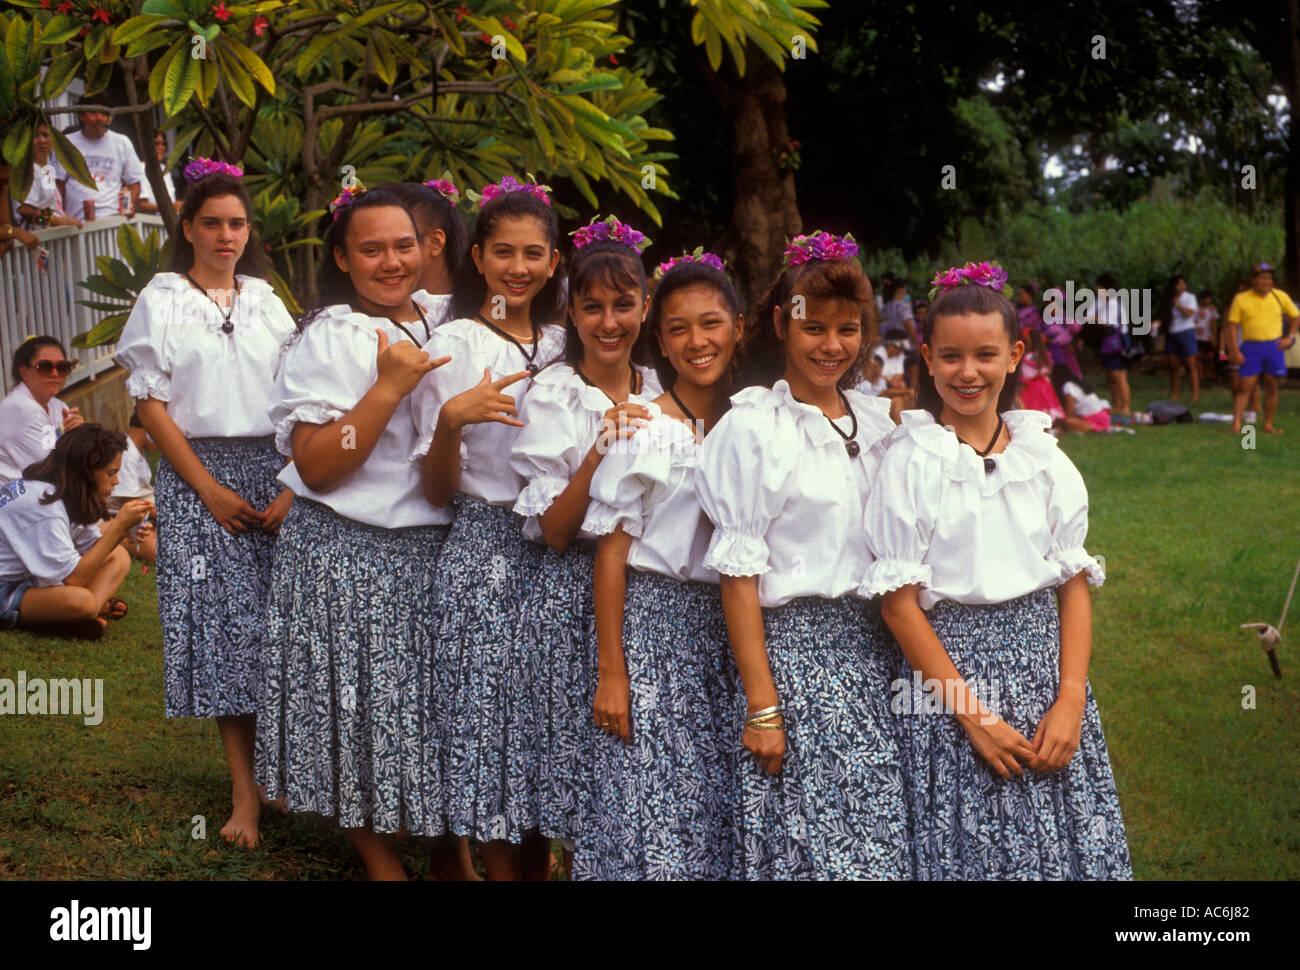 hawaii insel madchen